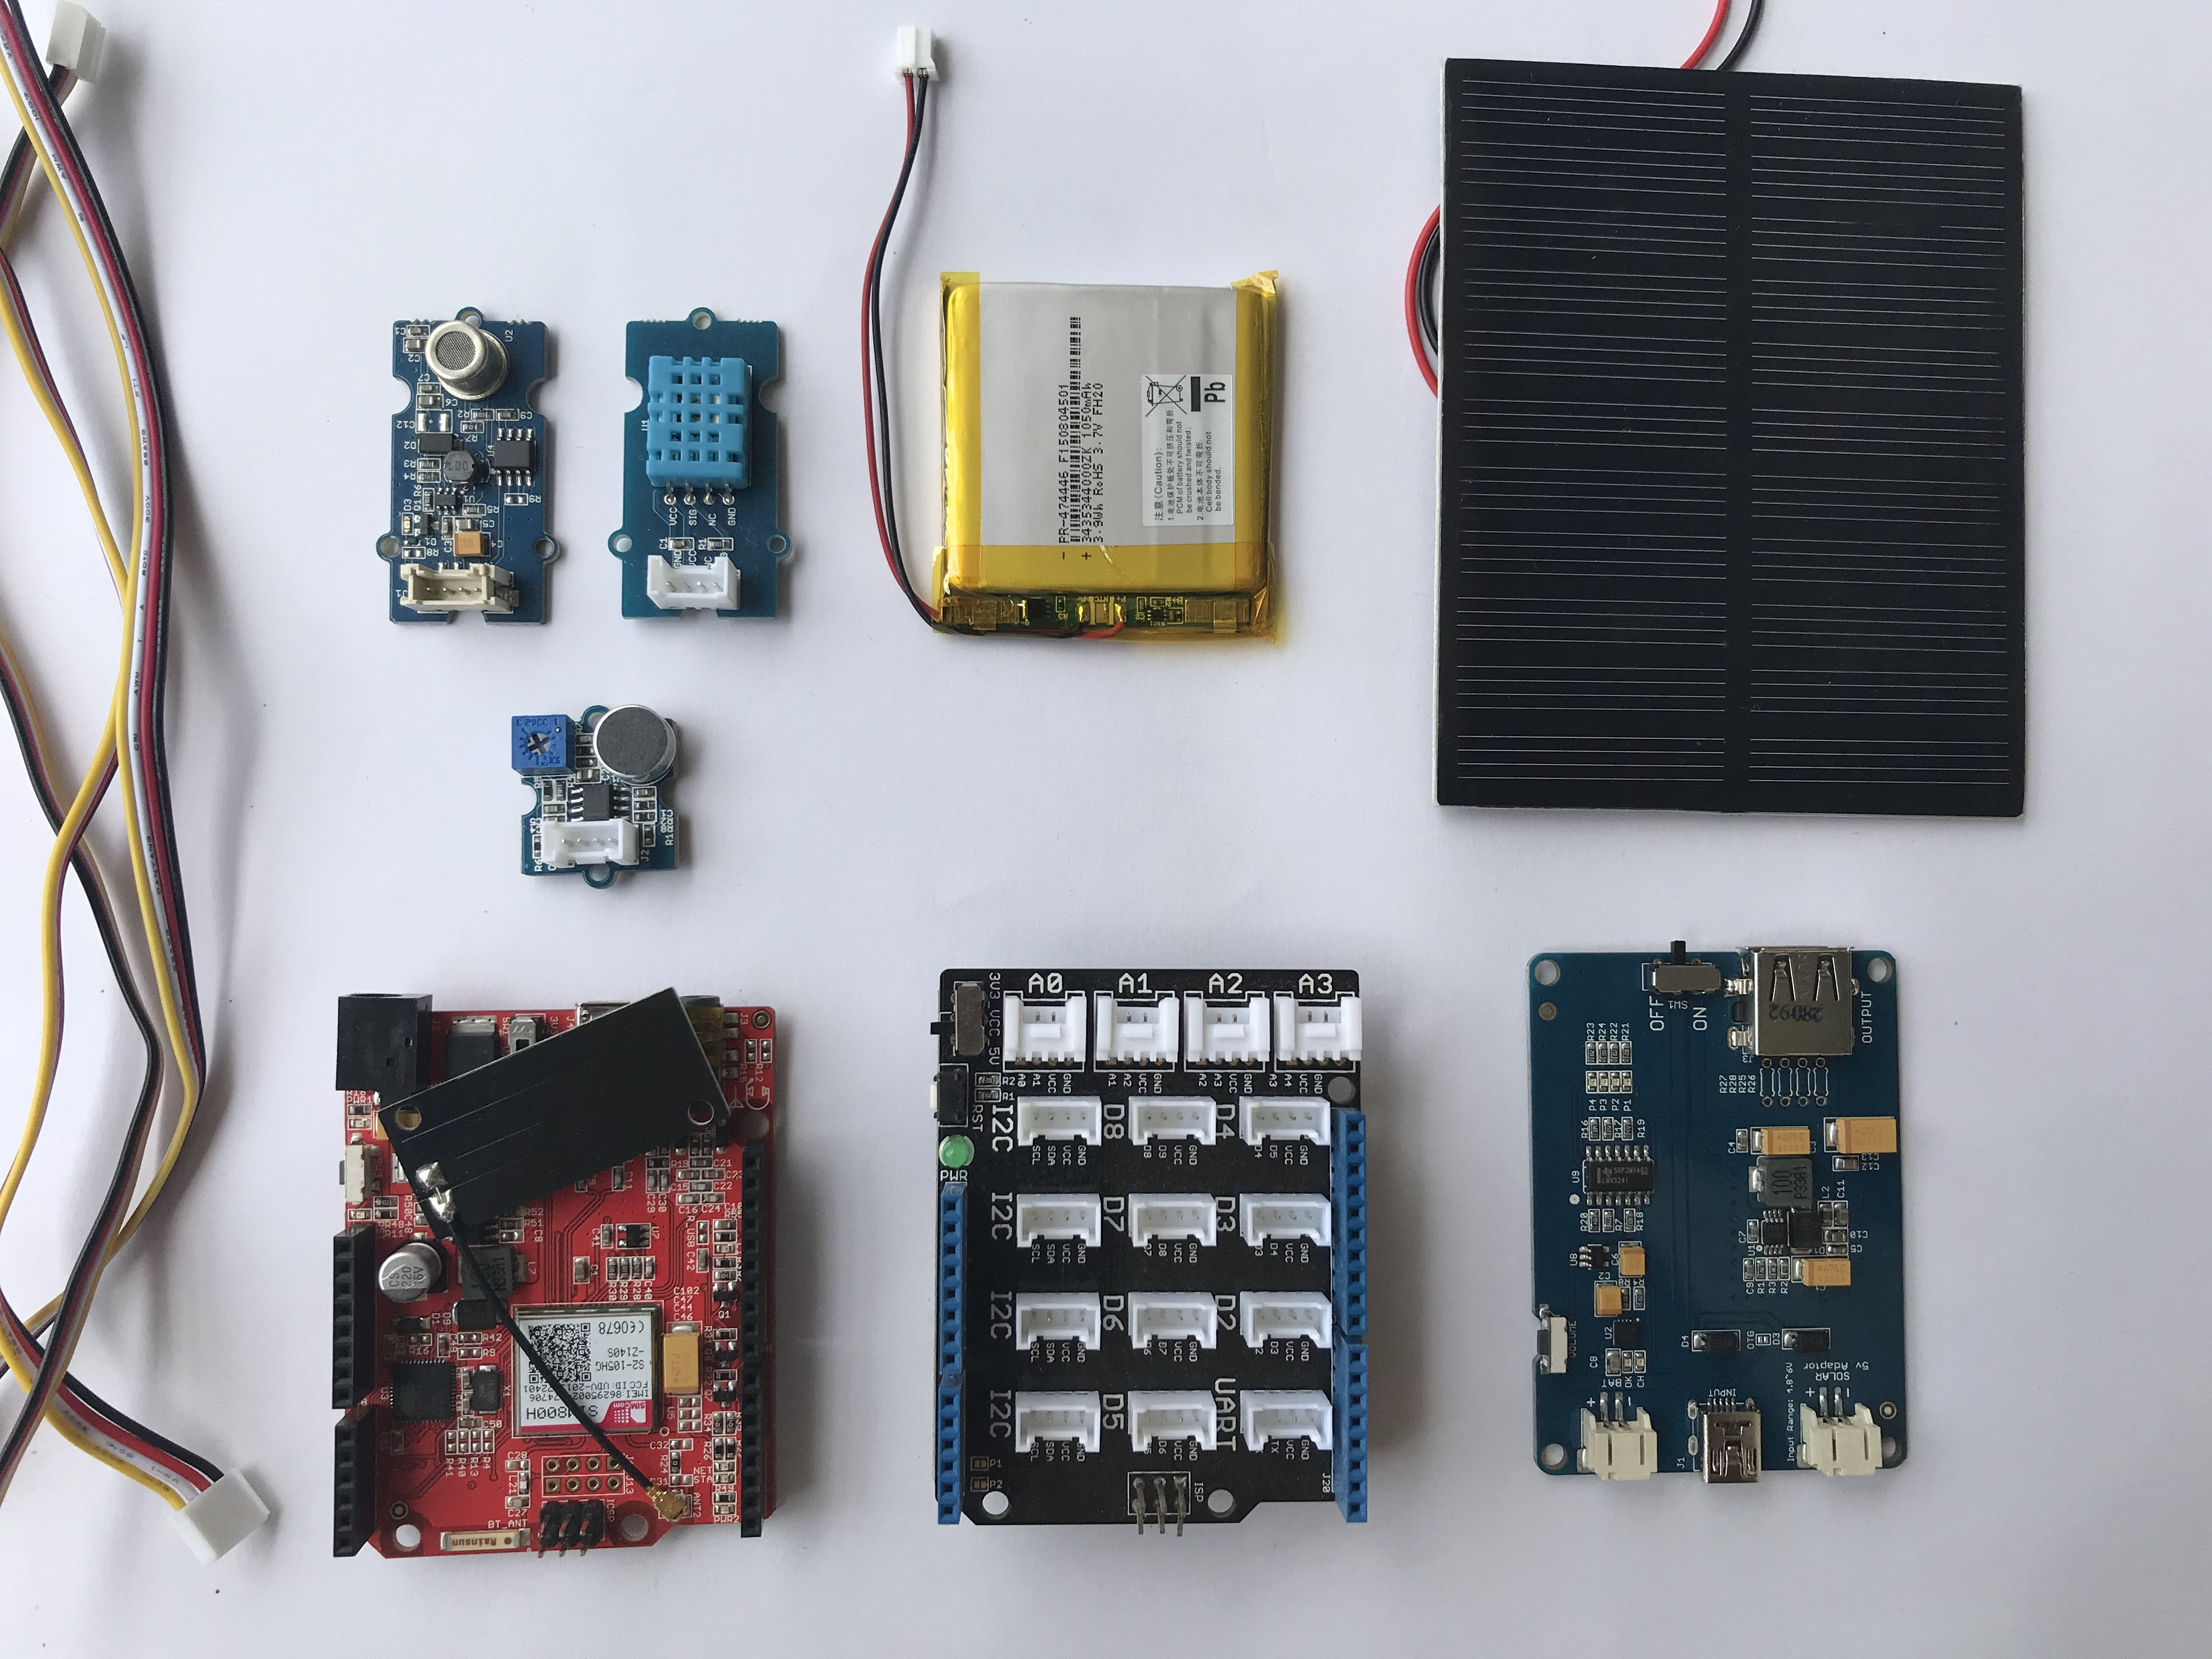 Required components (Grove air quality sensor, Grove sound sensor, Grove temperature&humidity sensor, Seeeduino GPRS, Base Shield, Seeed 1W Solar panel, Seeed Lipo rider pro & Lipo battery)